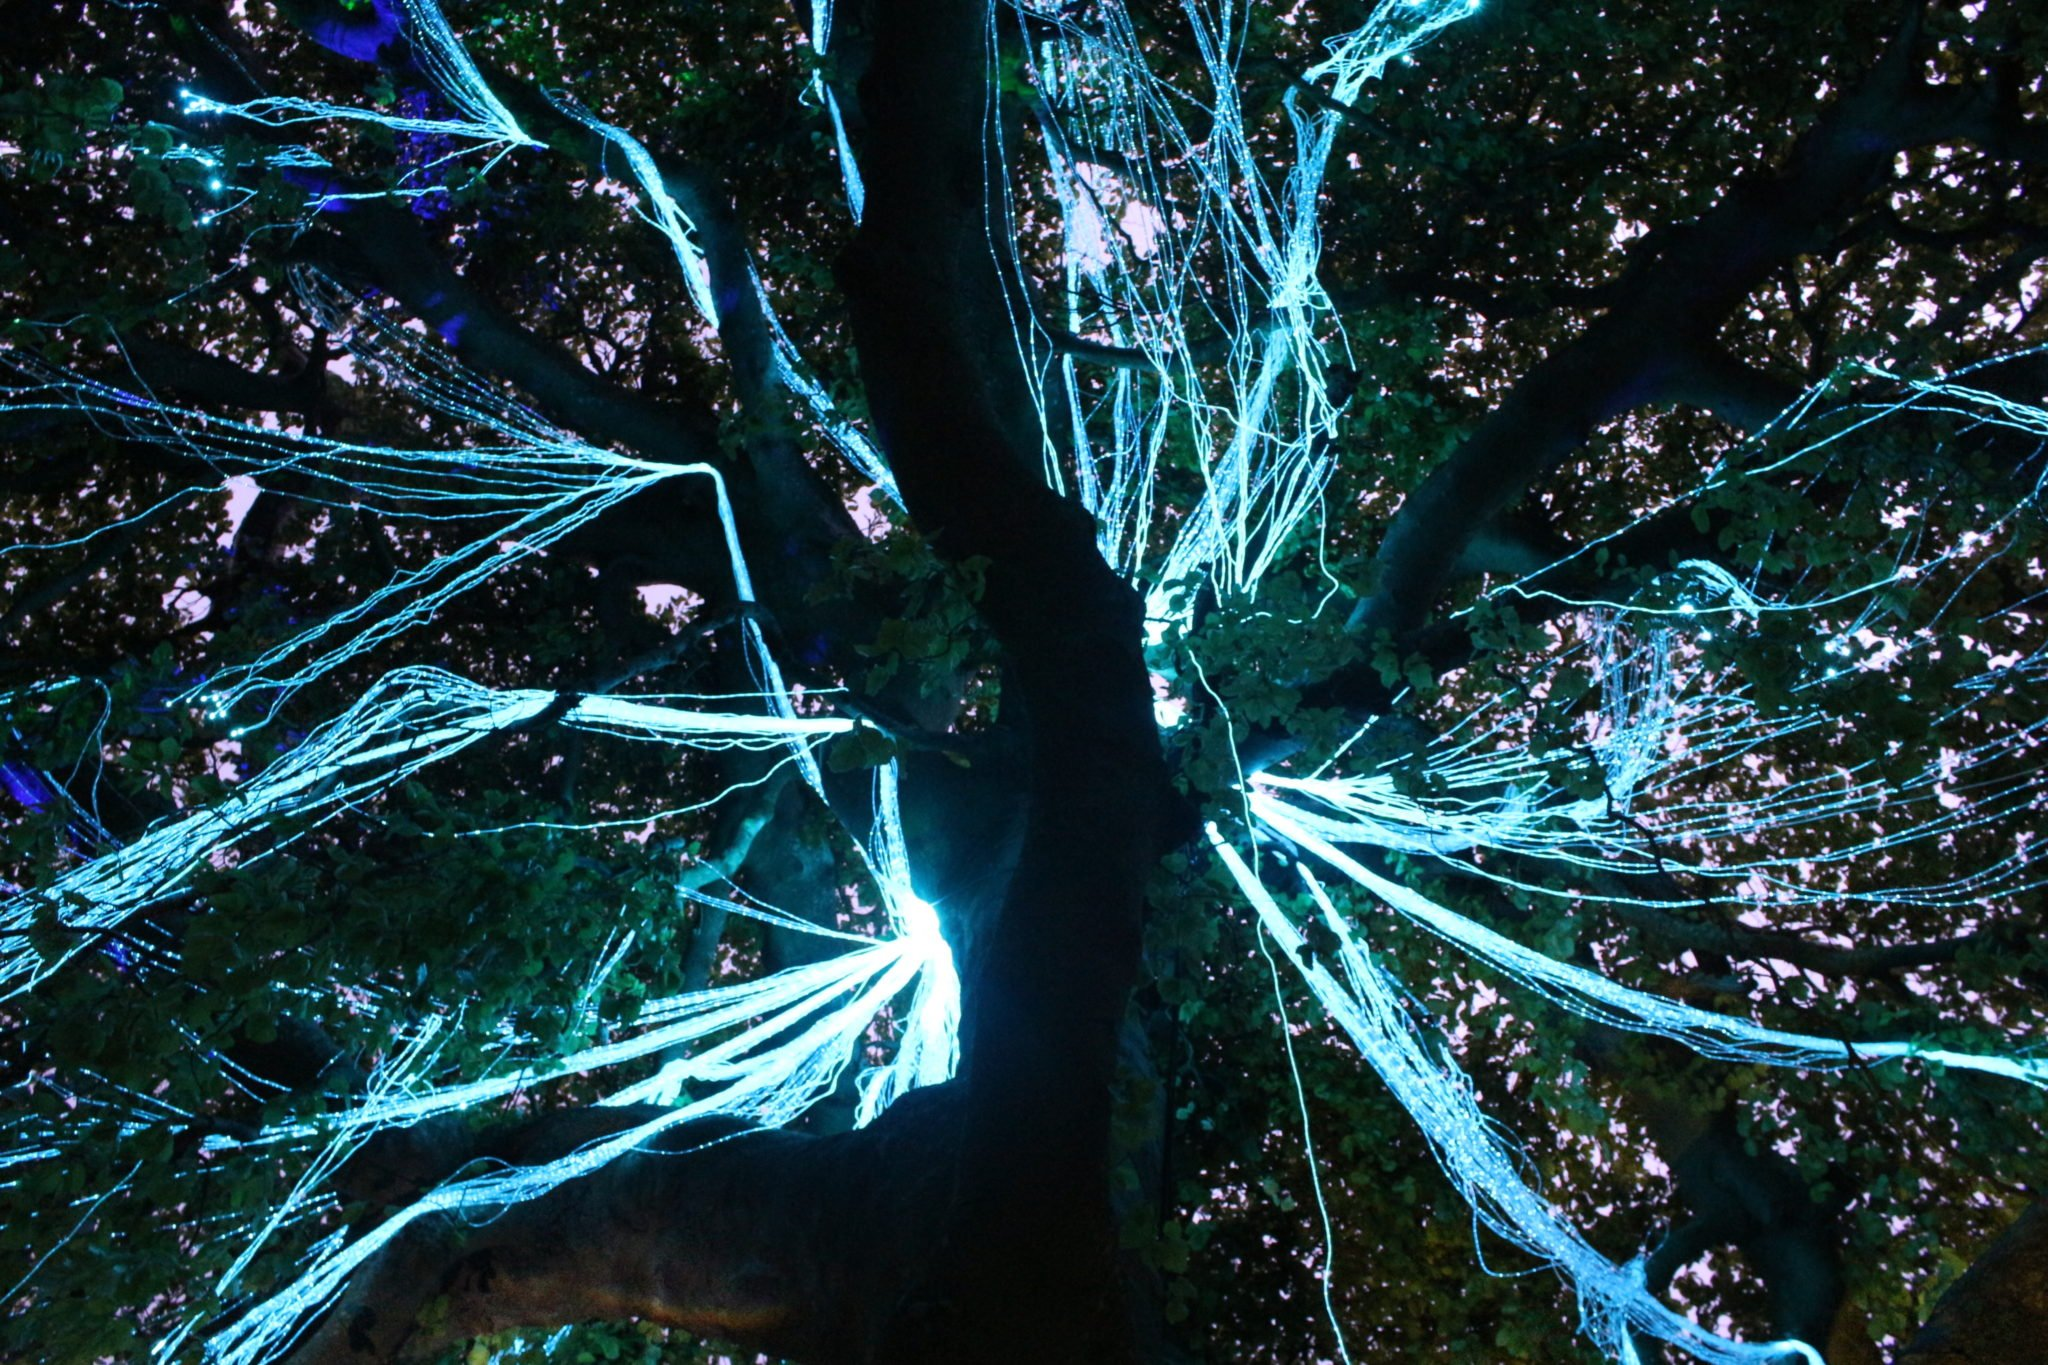 Fibre optic side glow